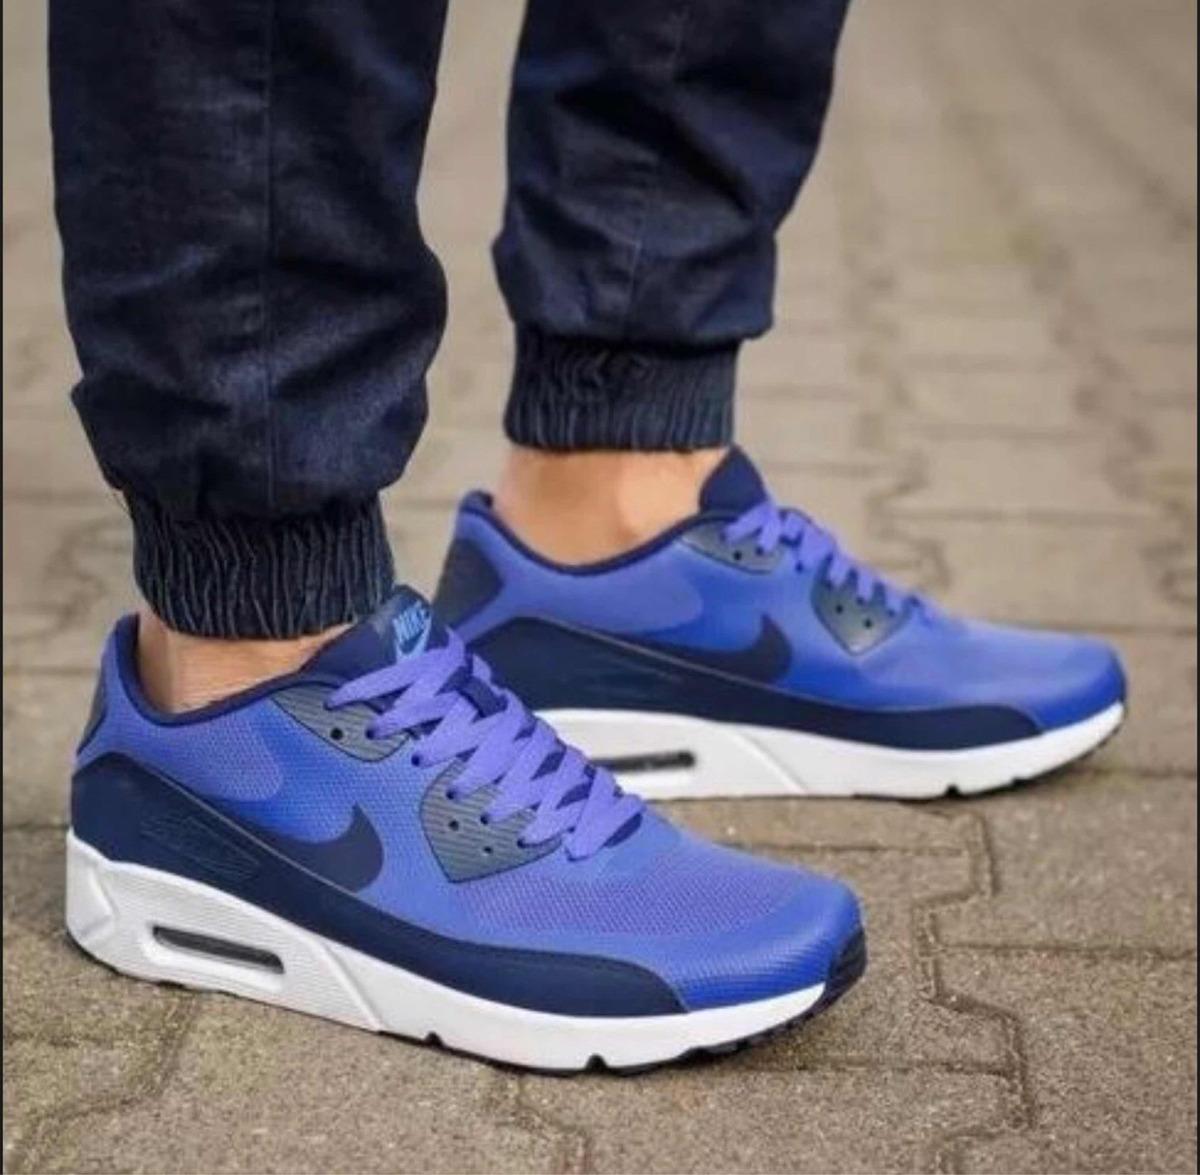 sports shoes 83c90 d4e5b zapatillas nike air max 90 ultra essential 2.0. Cargando zoom.